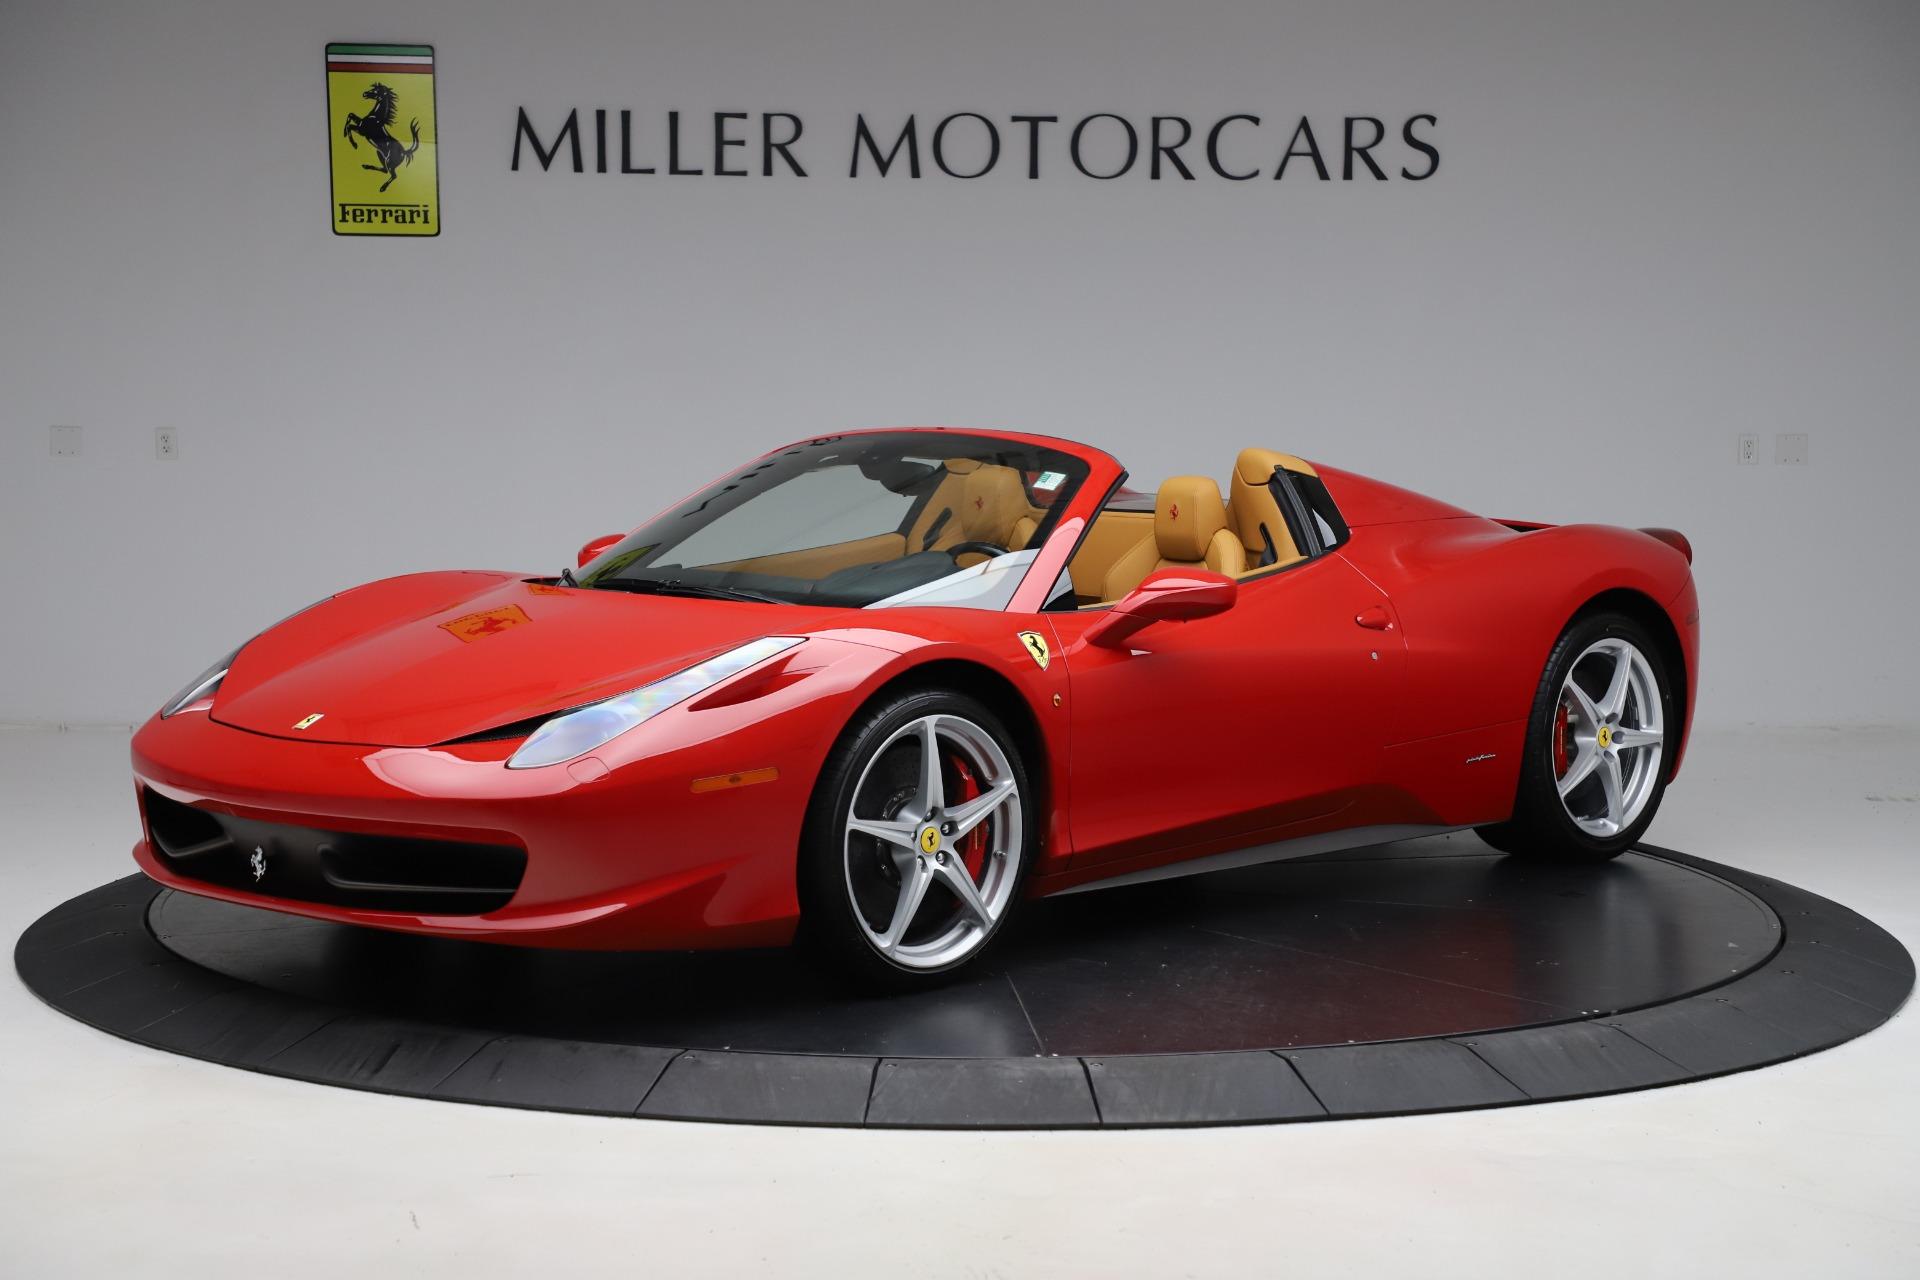 Pre Owned 2015 Ferrari 458 Spider For Sale 234 900 Mclaren Greenwich Stock 4666a